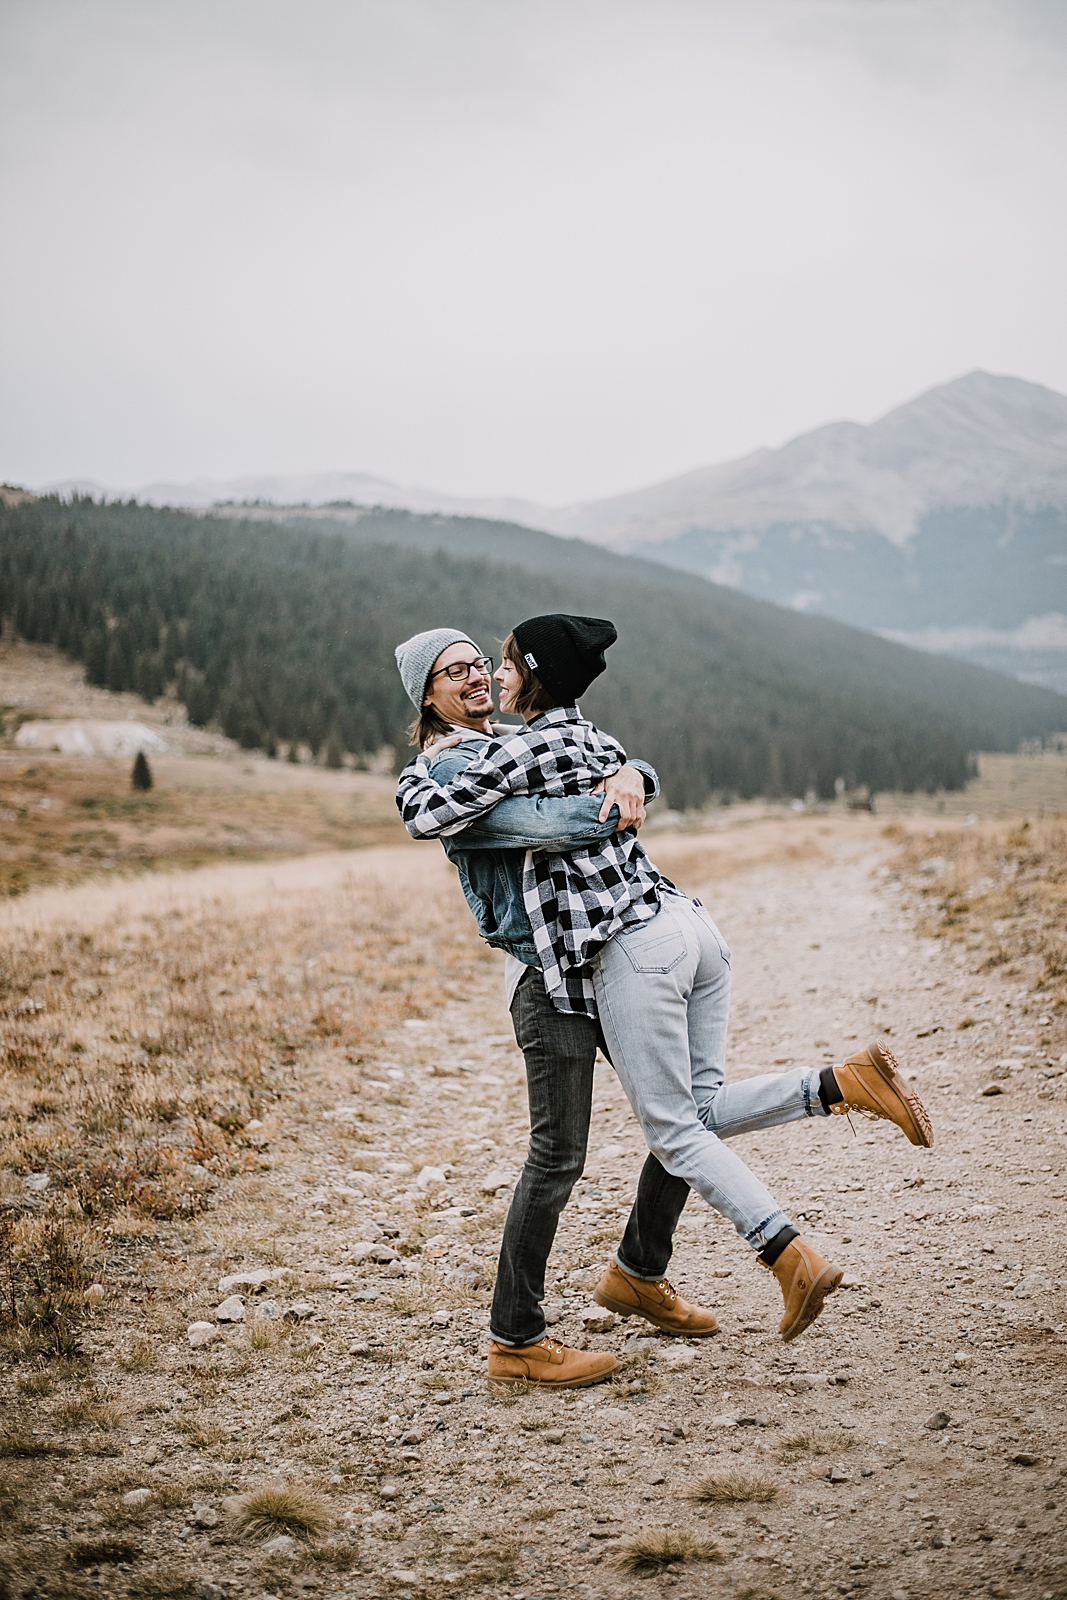 couple dancing, colorado surprise proposal, hike mayflower gulch, mayflower gulch proposal, mayflower gulch elopement, mayflower gulch wedding, colorado 14er, colorado fourteener, leadville elopement